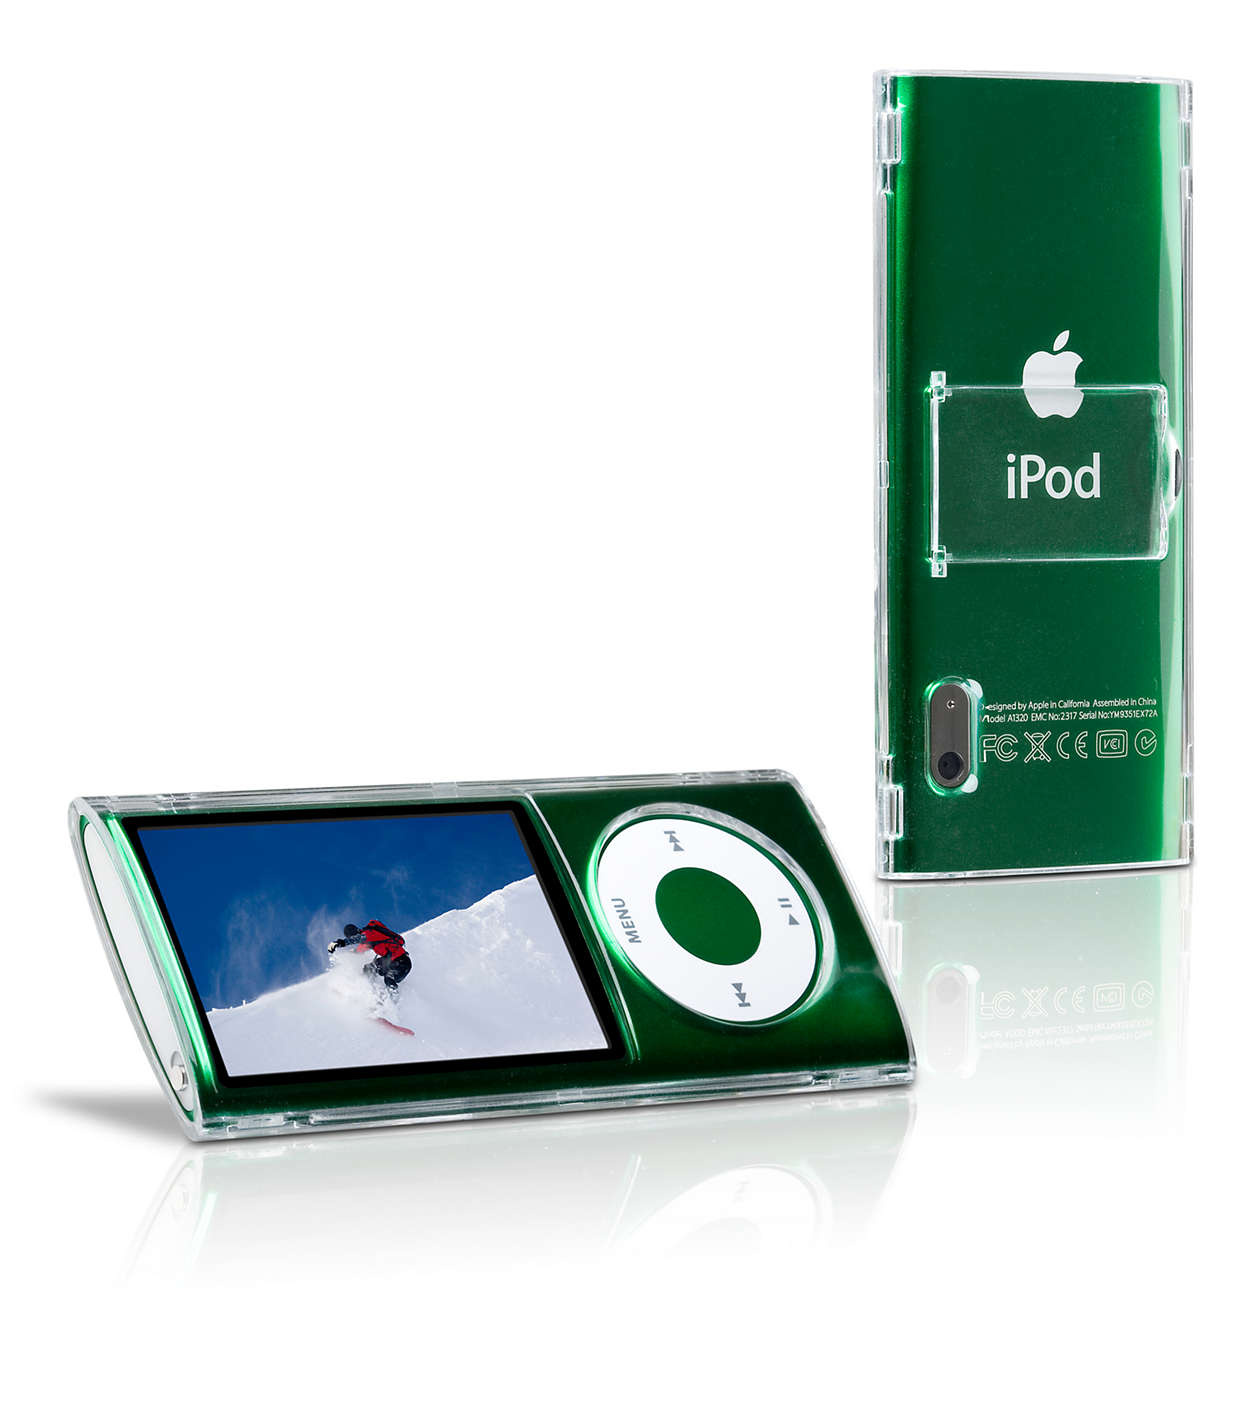 Beskyt din iPod i et klart etui